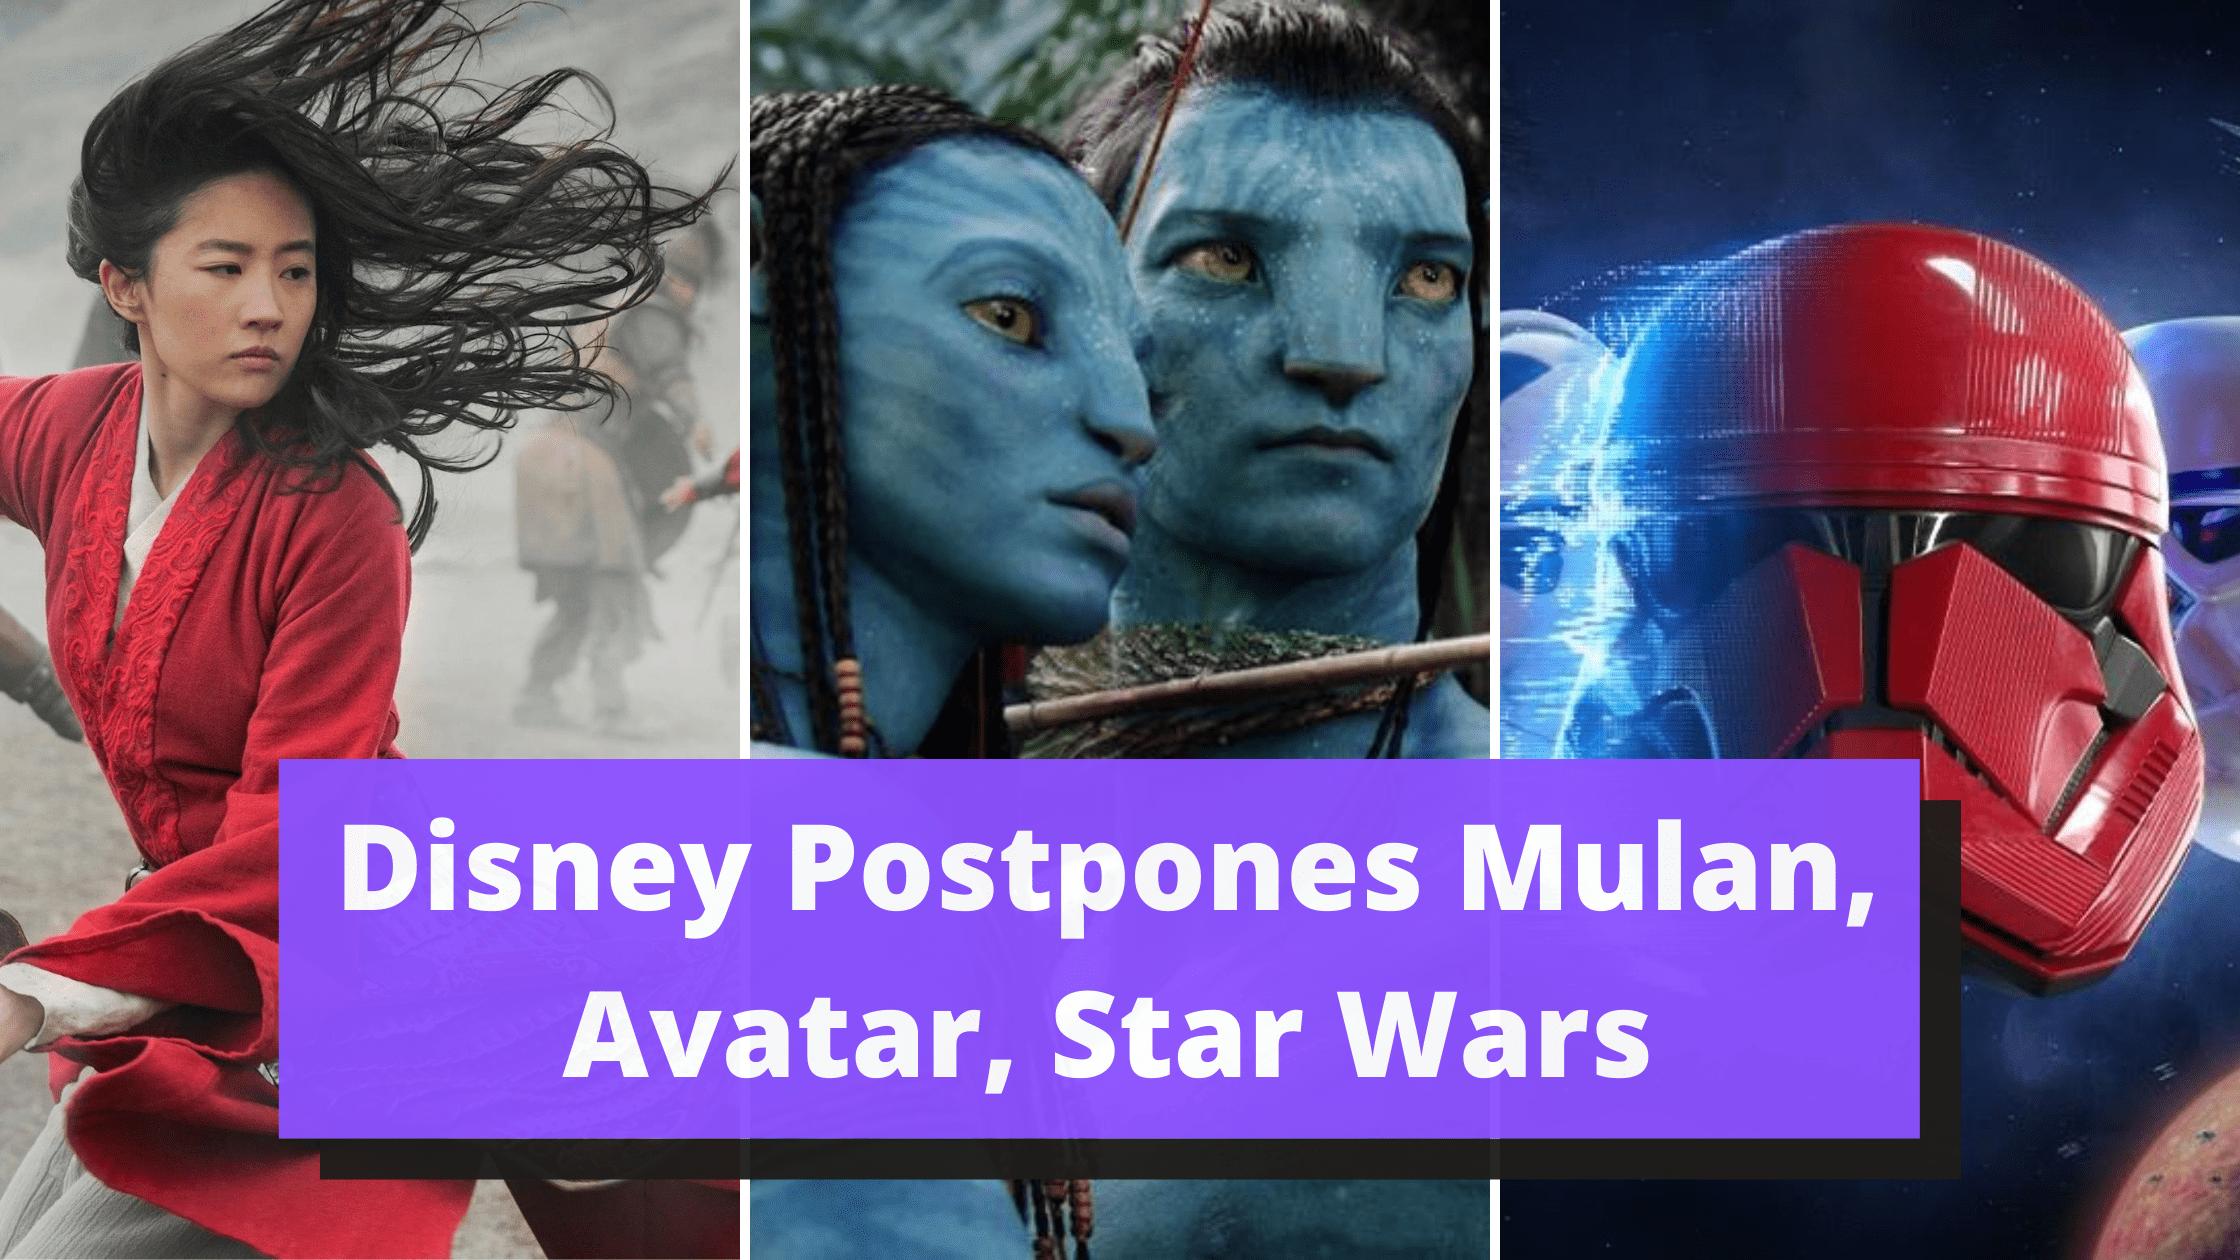 Disney-Postpones-Mulan-Avatar-Star-Wars